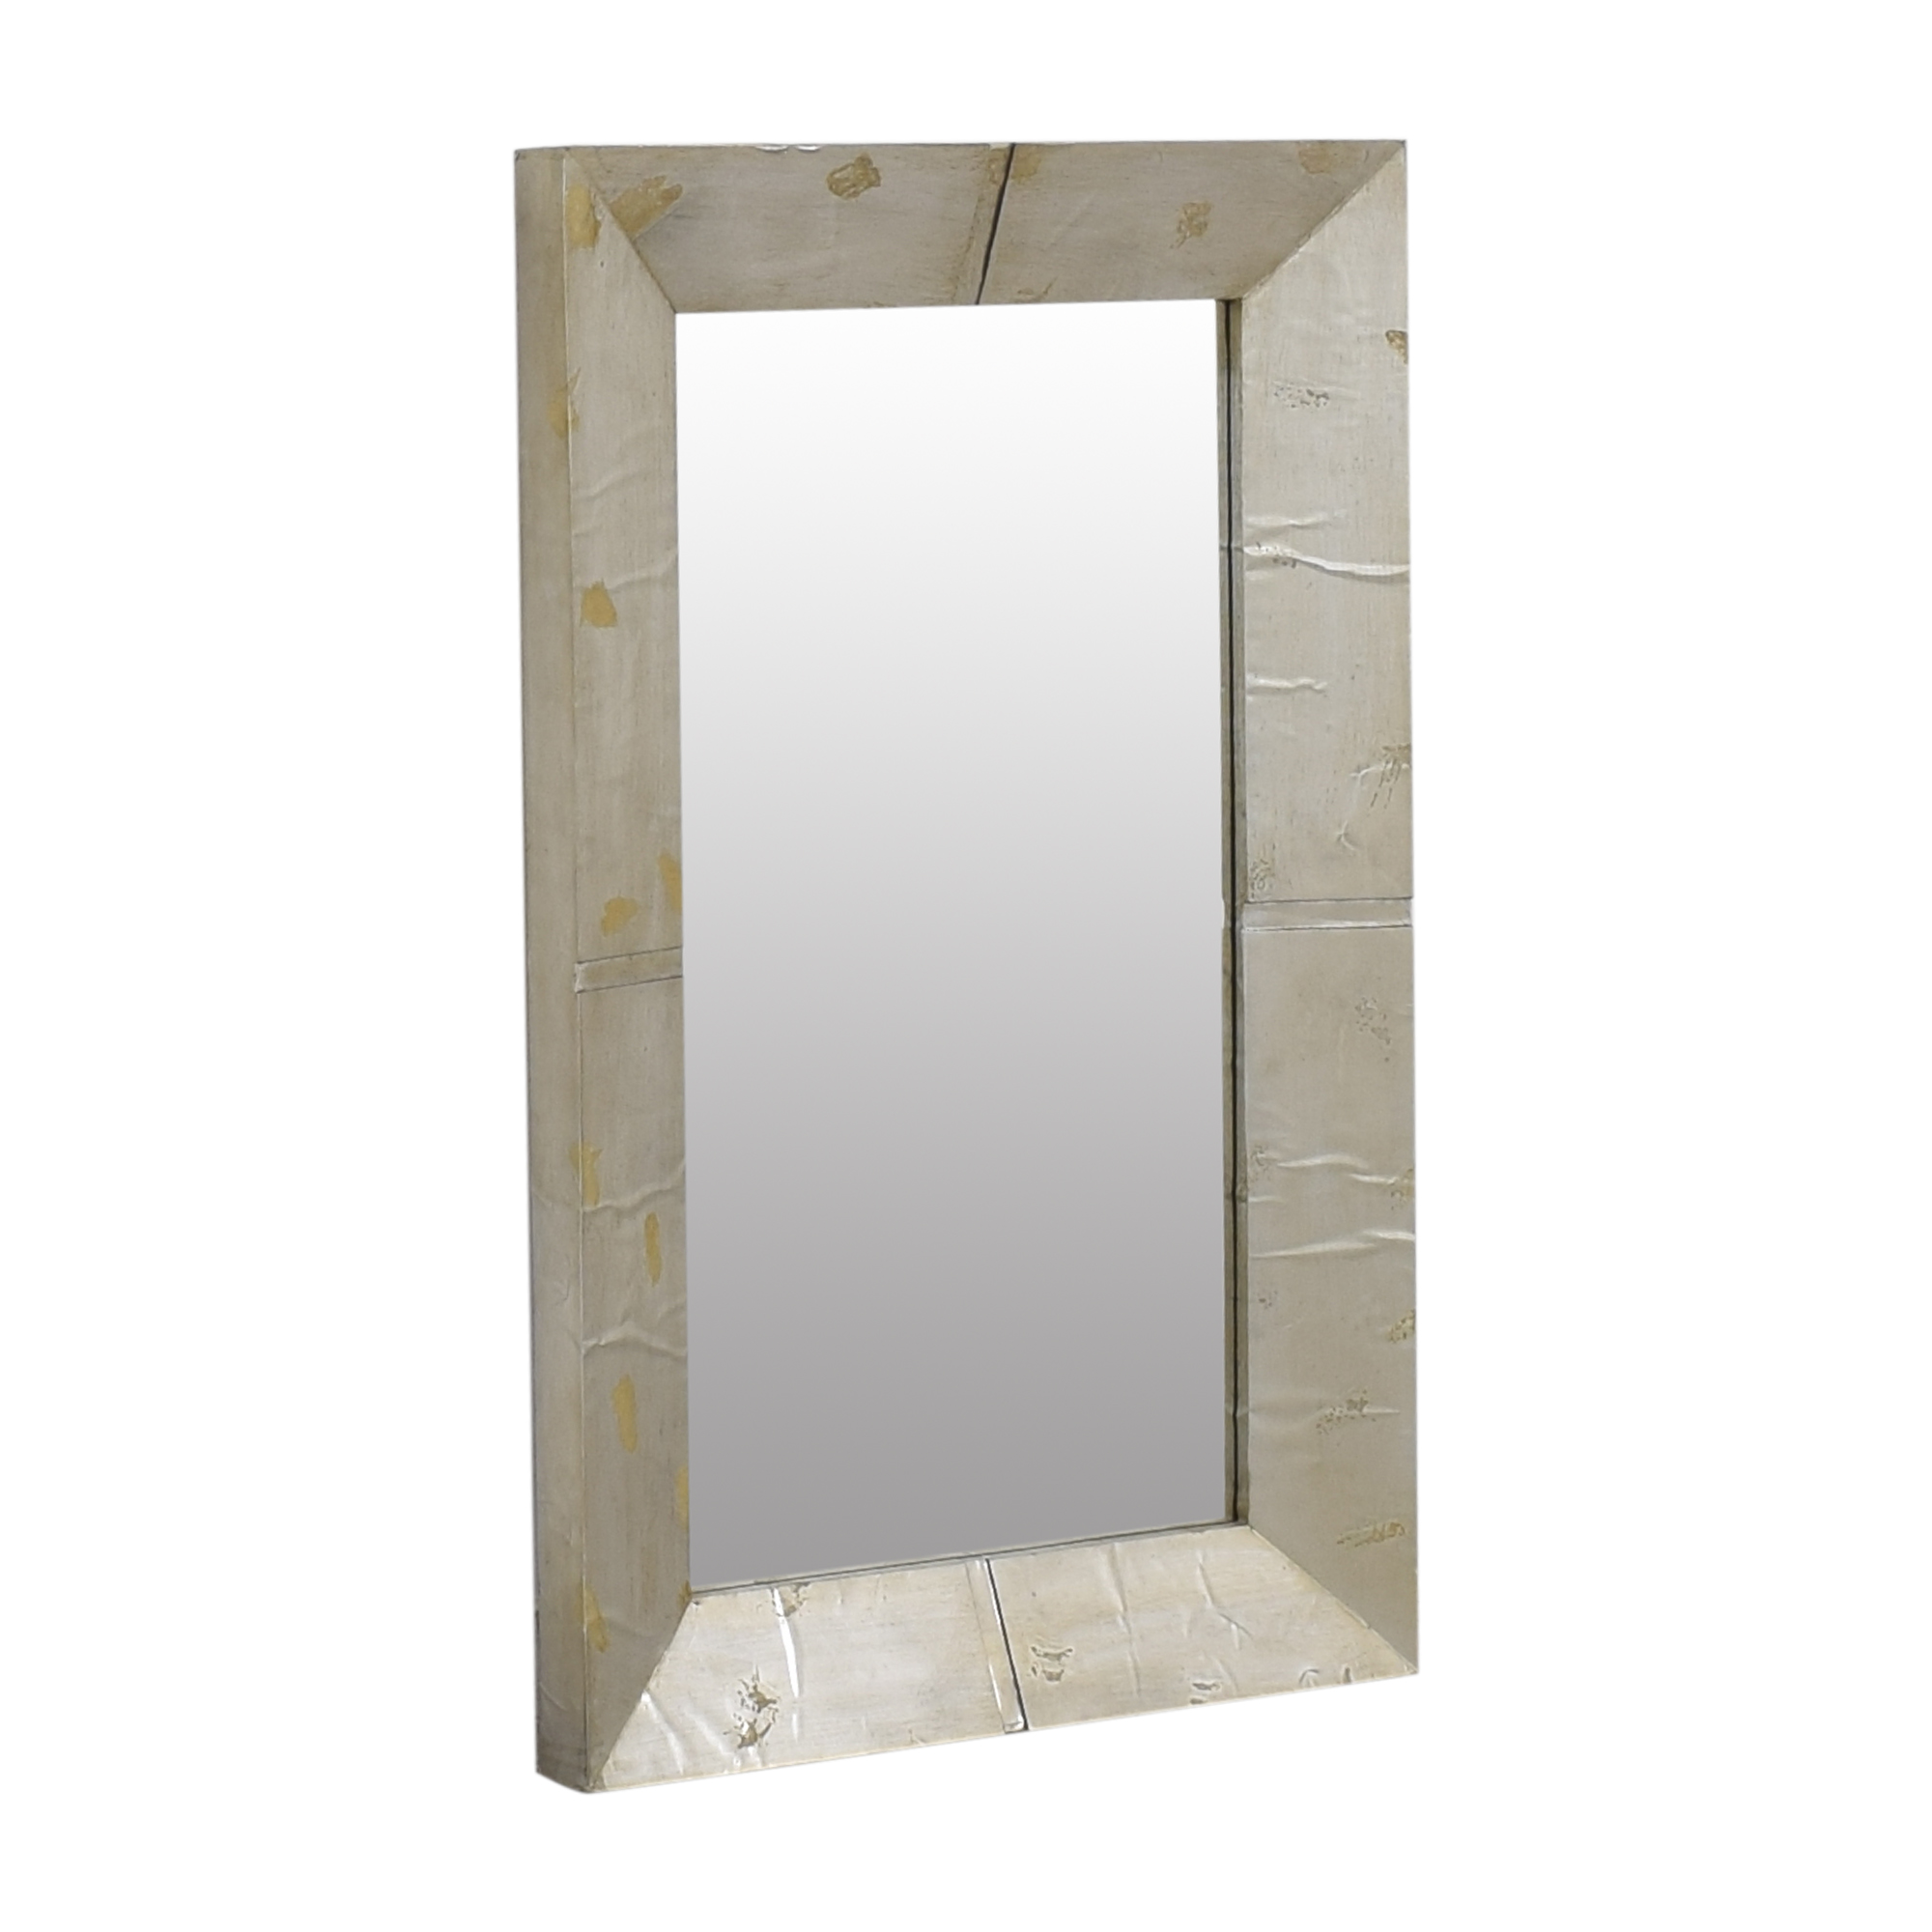 Dot & Bo Dot & Bo Elegant Wall Mirror for sale